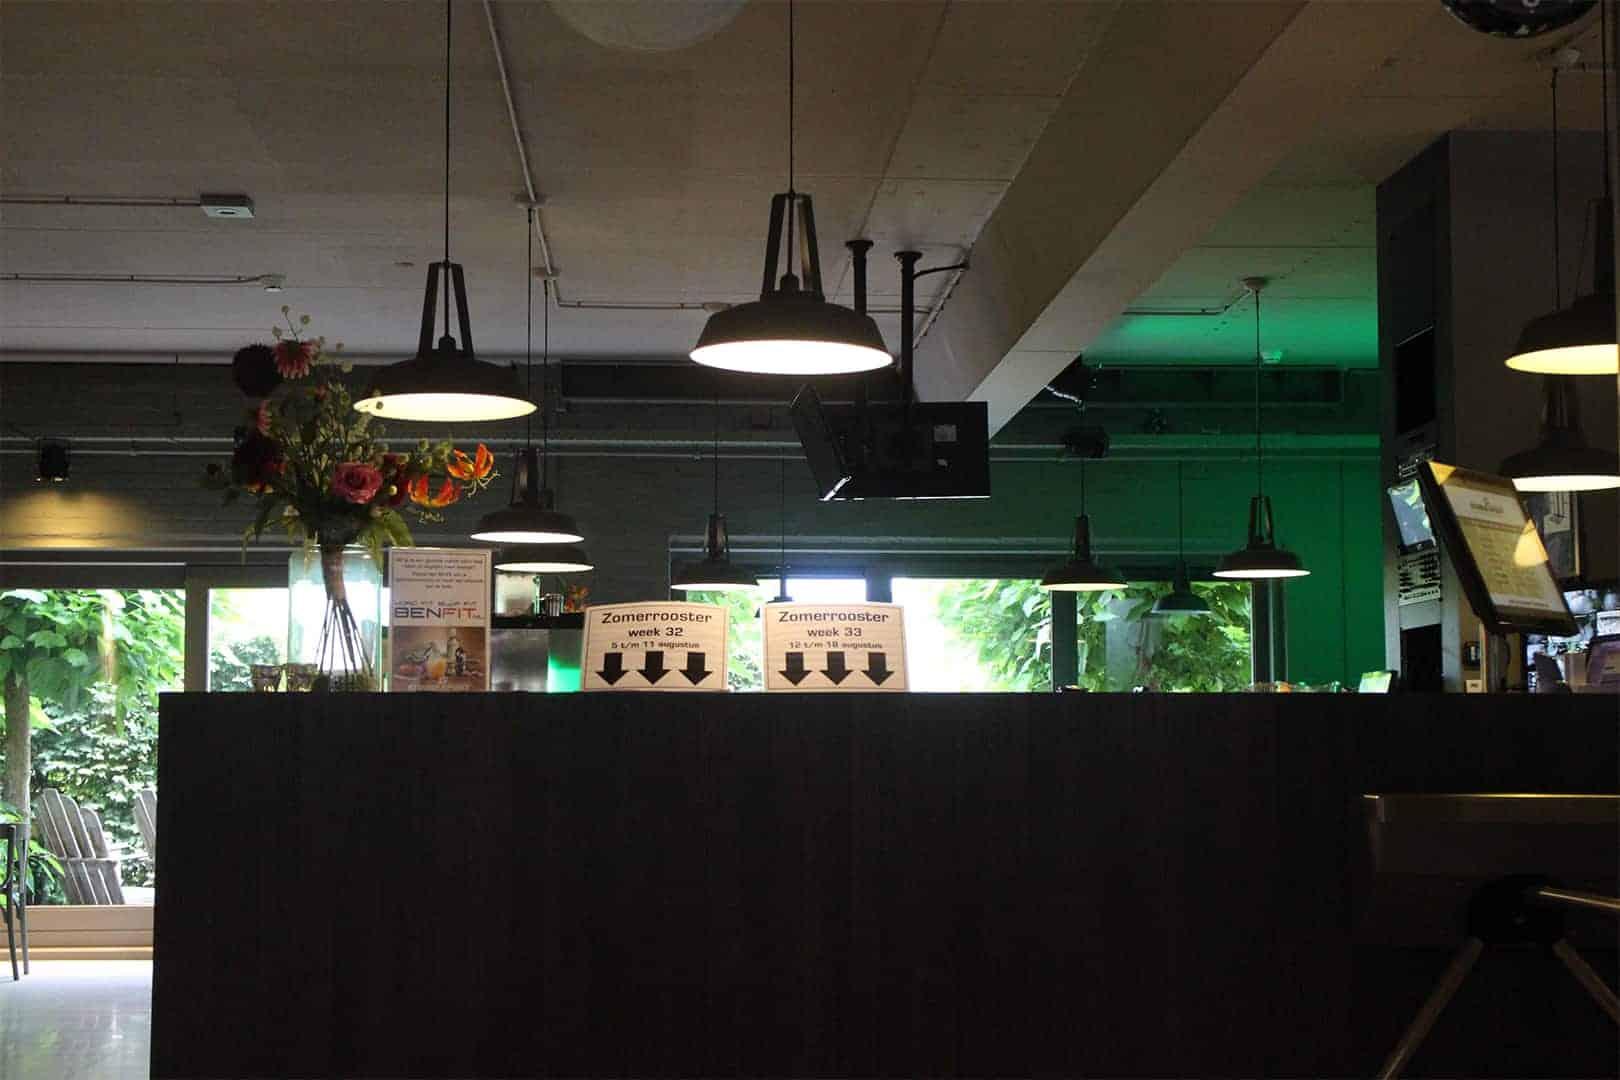 Bar Studiosport Tubbergen 108